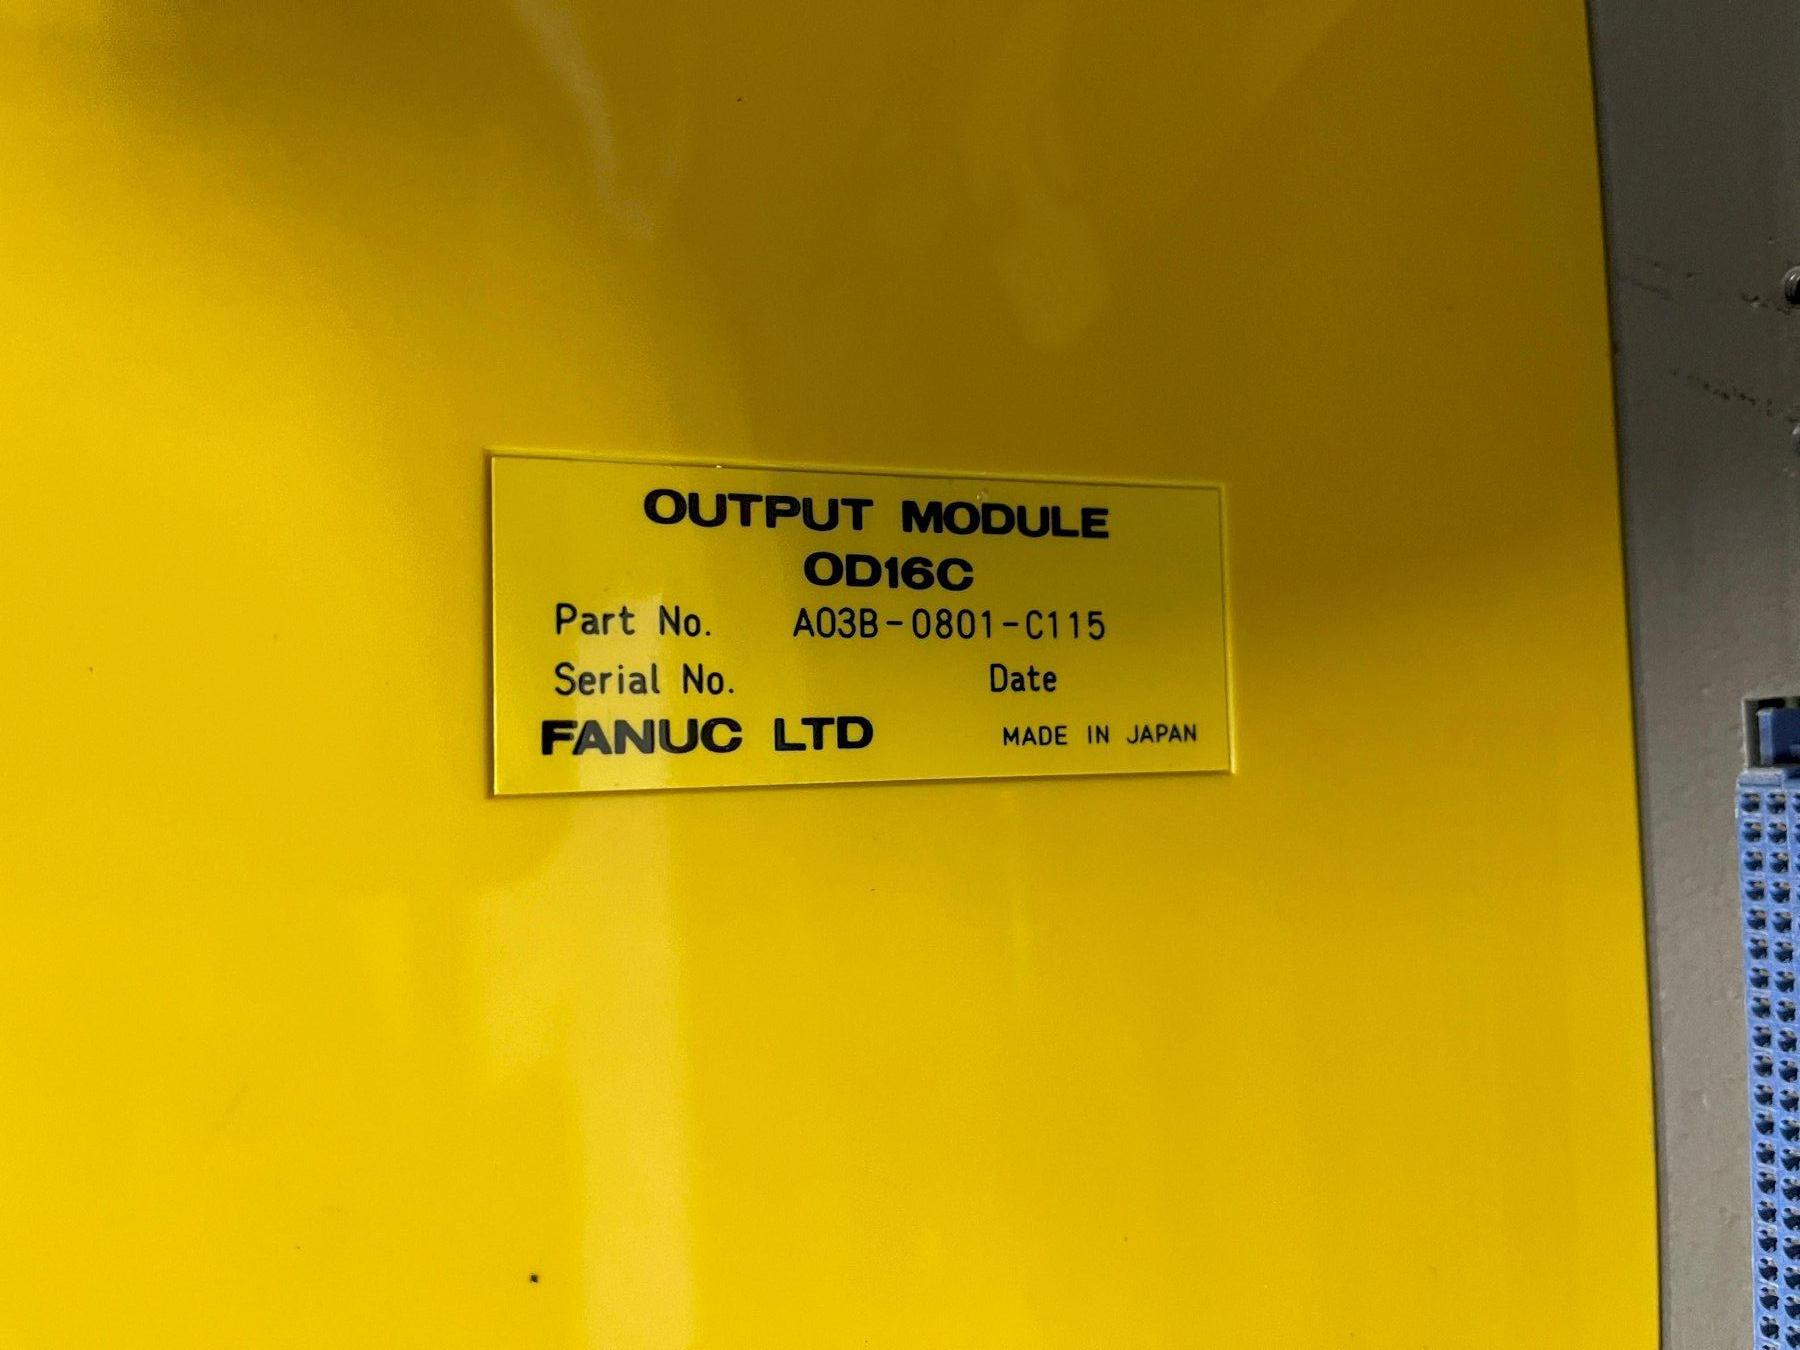 FANUC I/O RACK - MULTIPLE BOARDS ATTACHED